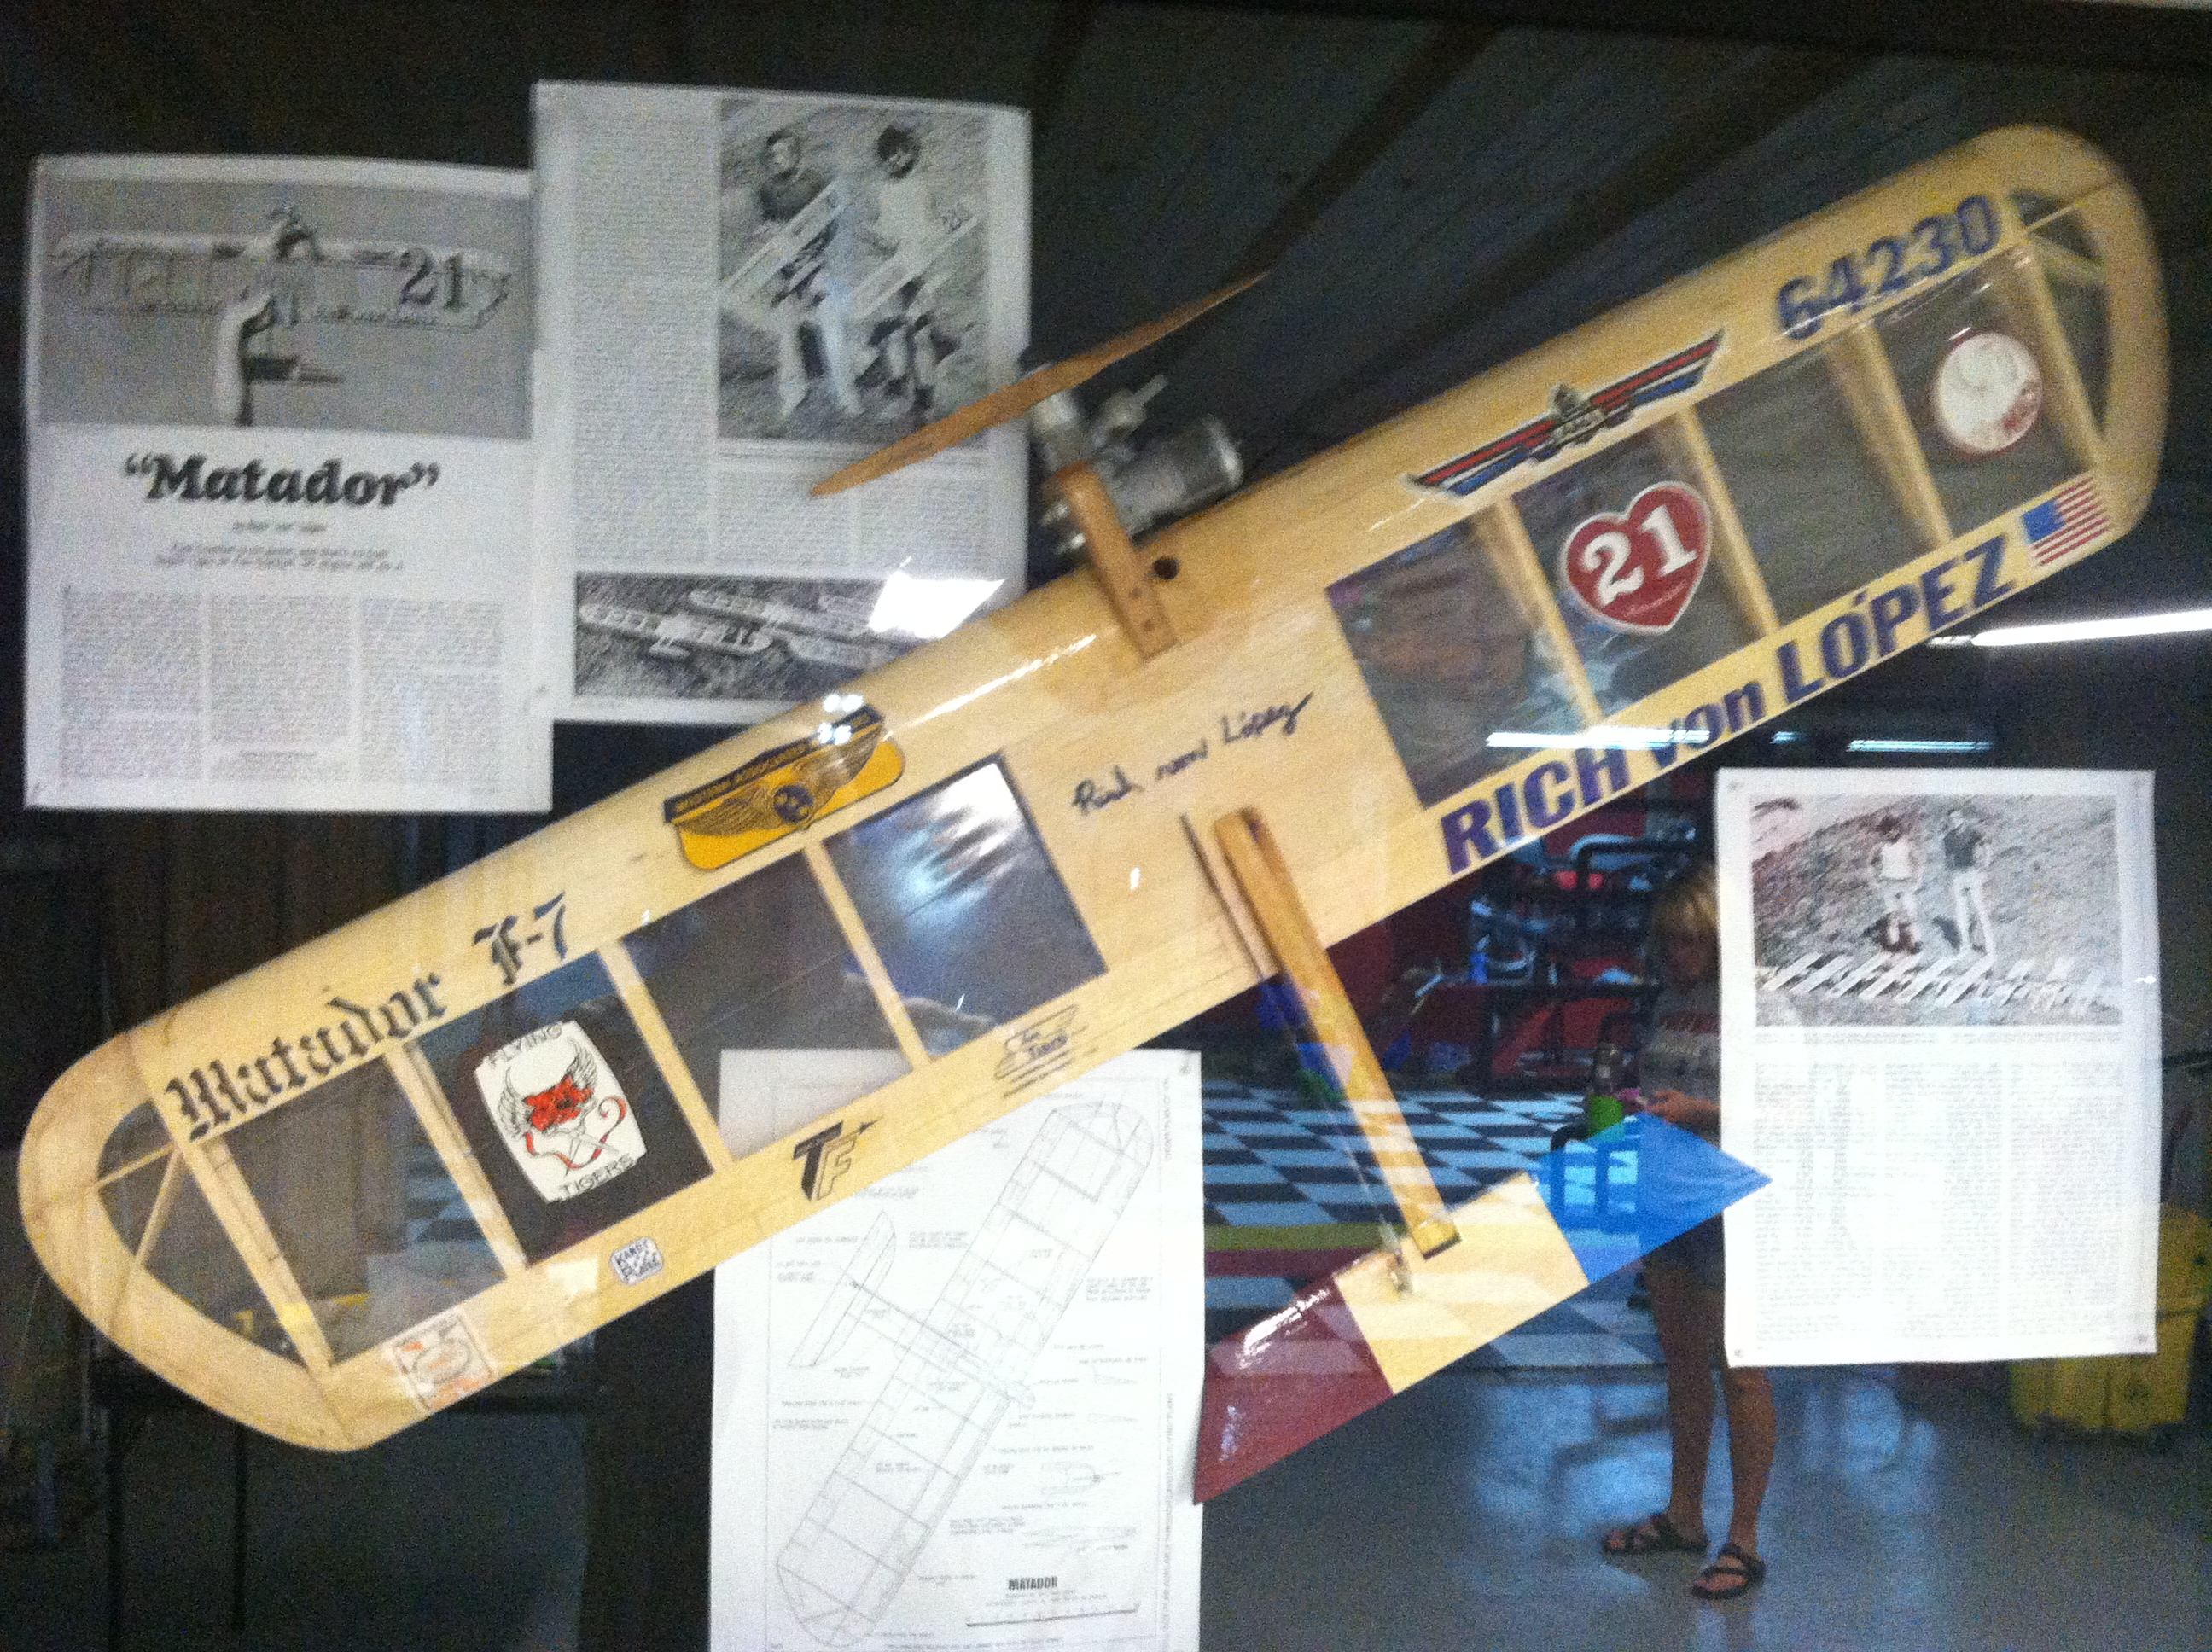 Click image for larger version  Name:Matador.JPG Views:118 Size:2.26 MB ID:1944208